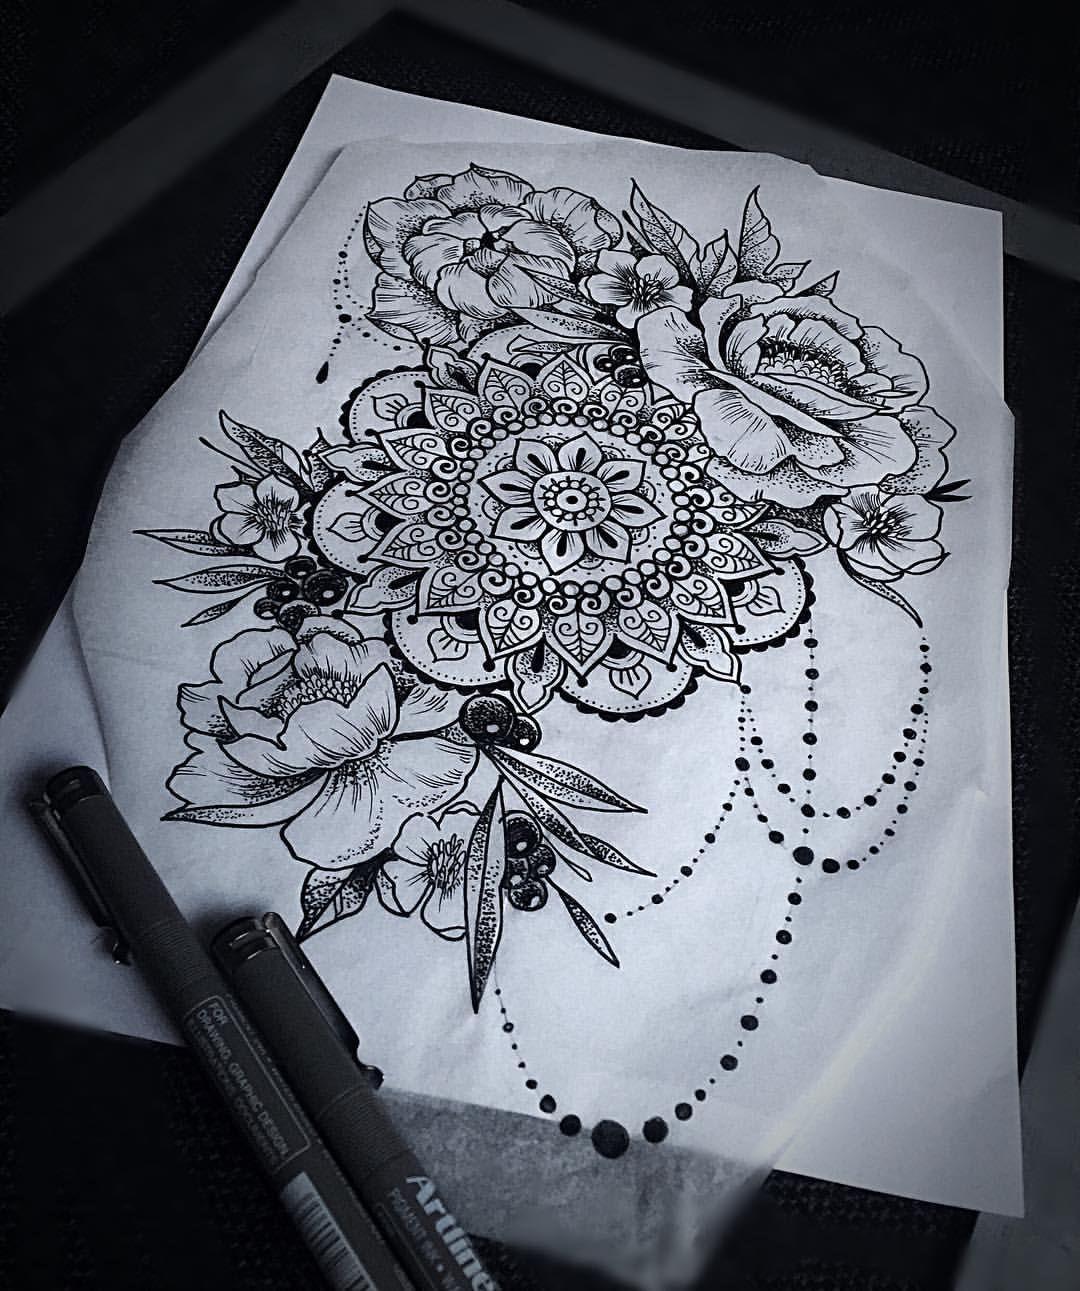 Consulta esta foto de instagram de stacyvl 139 me gusta barroco tattoo ideen - Instagram foto ideen ...